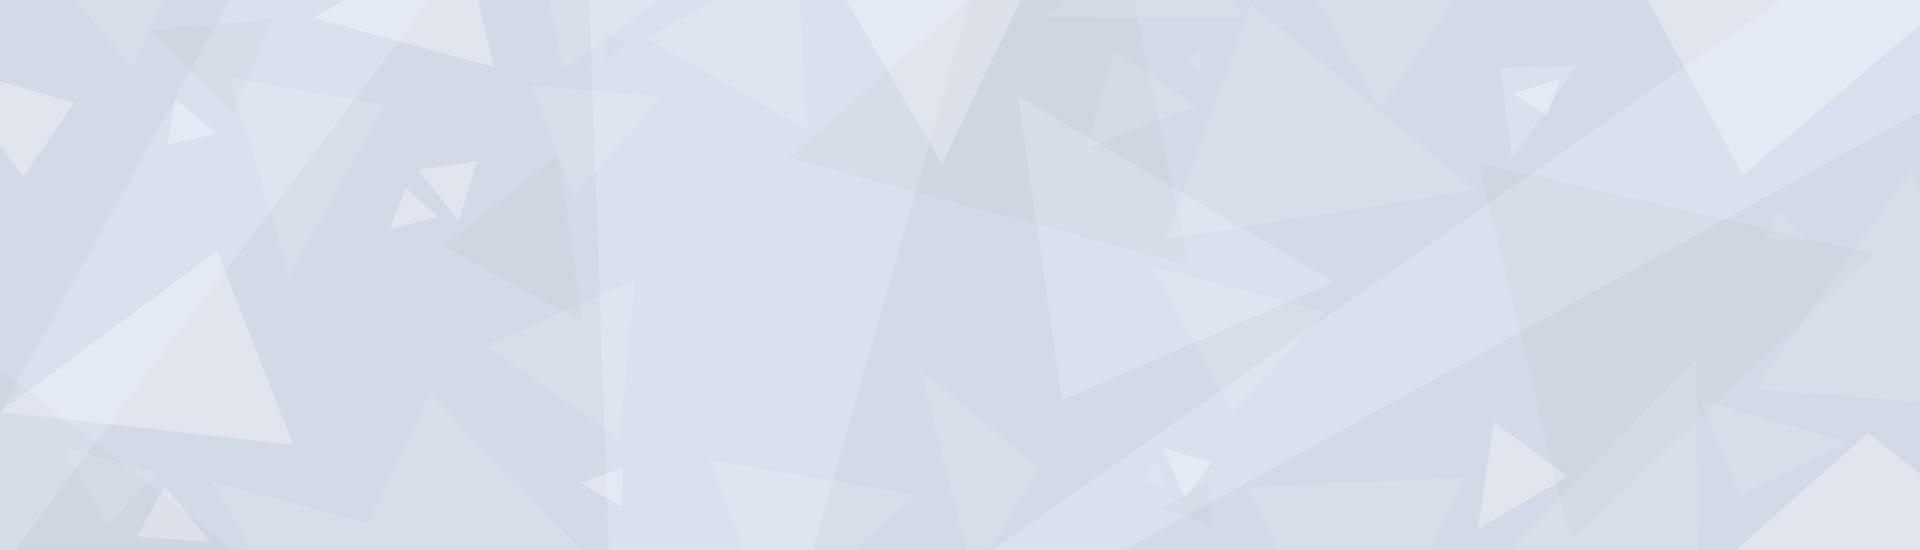 CodyBattler - VSLeague Online eSport